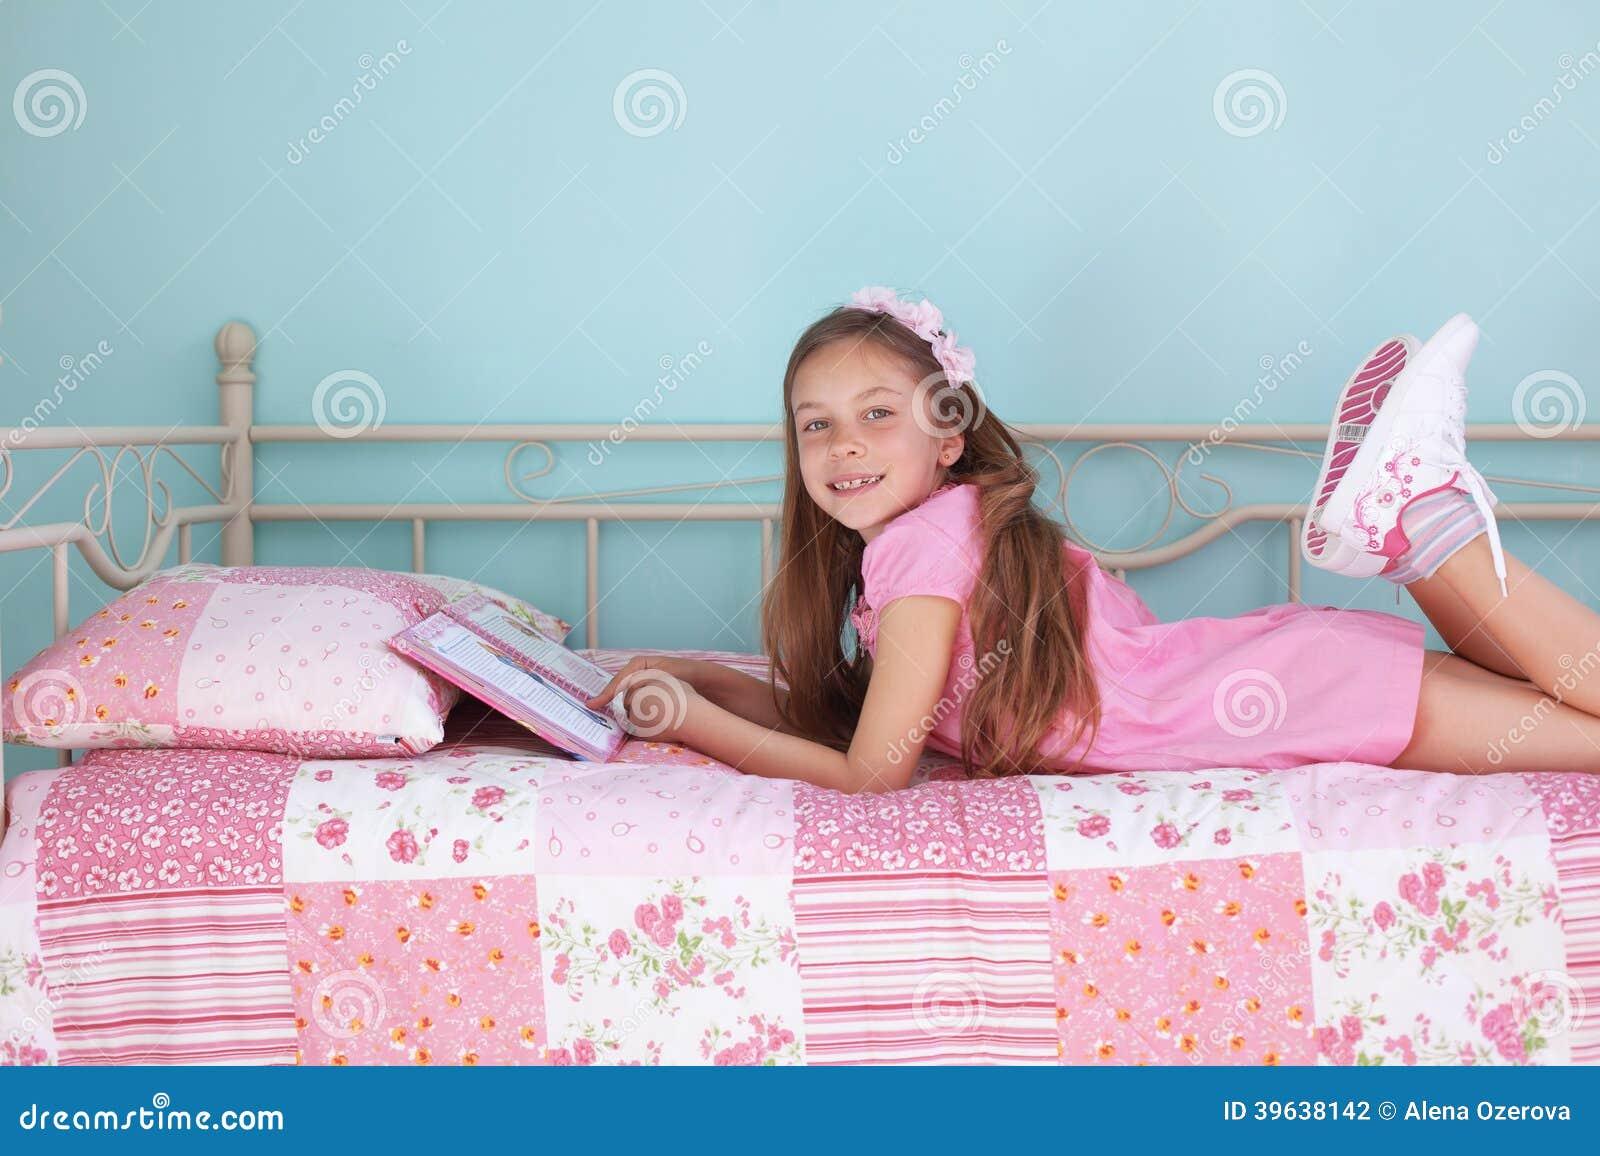 School Girl Reading Stock Photo - Image: 39638142